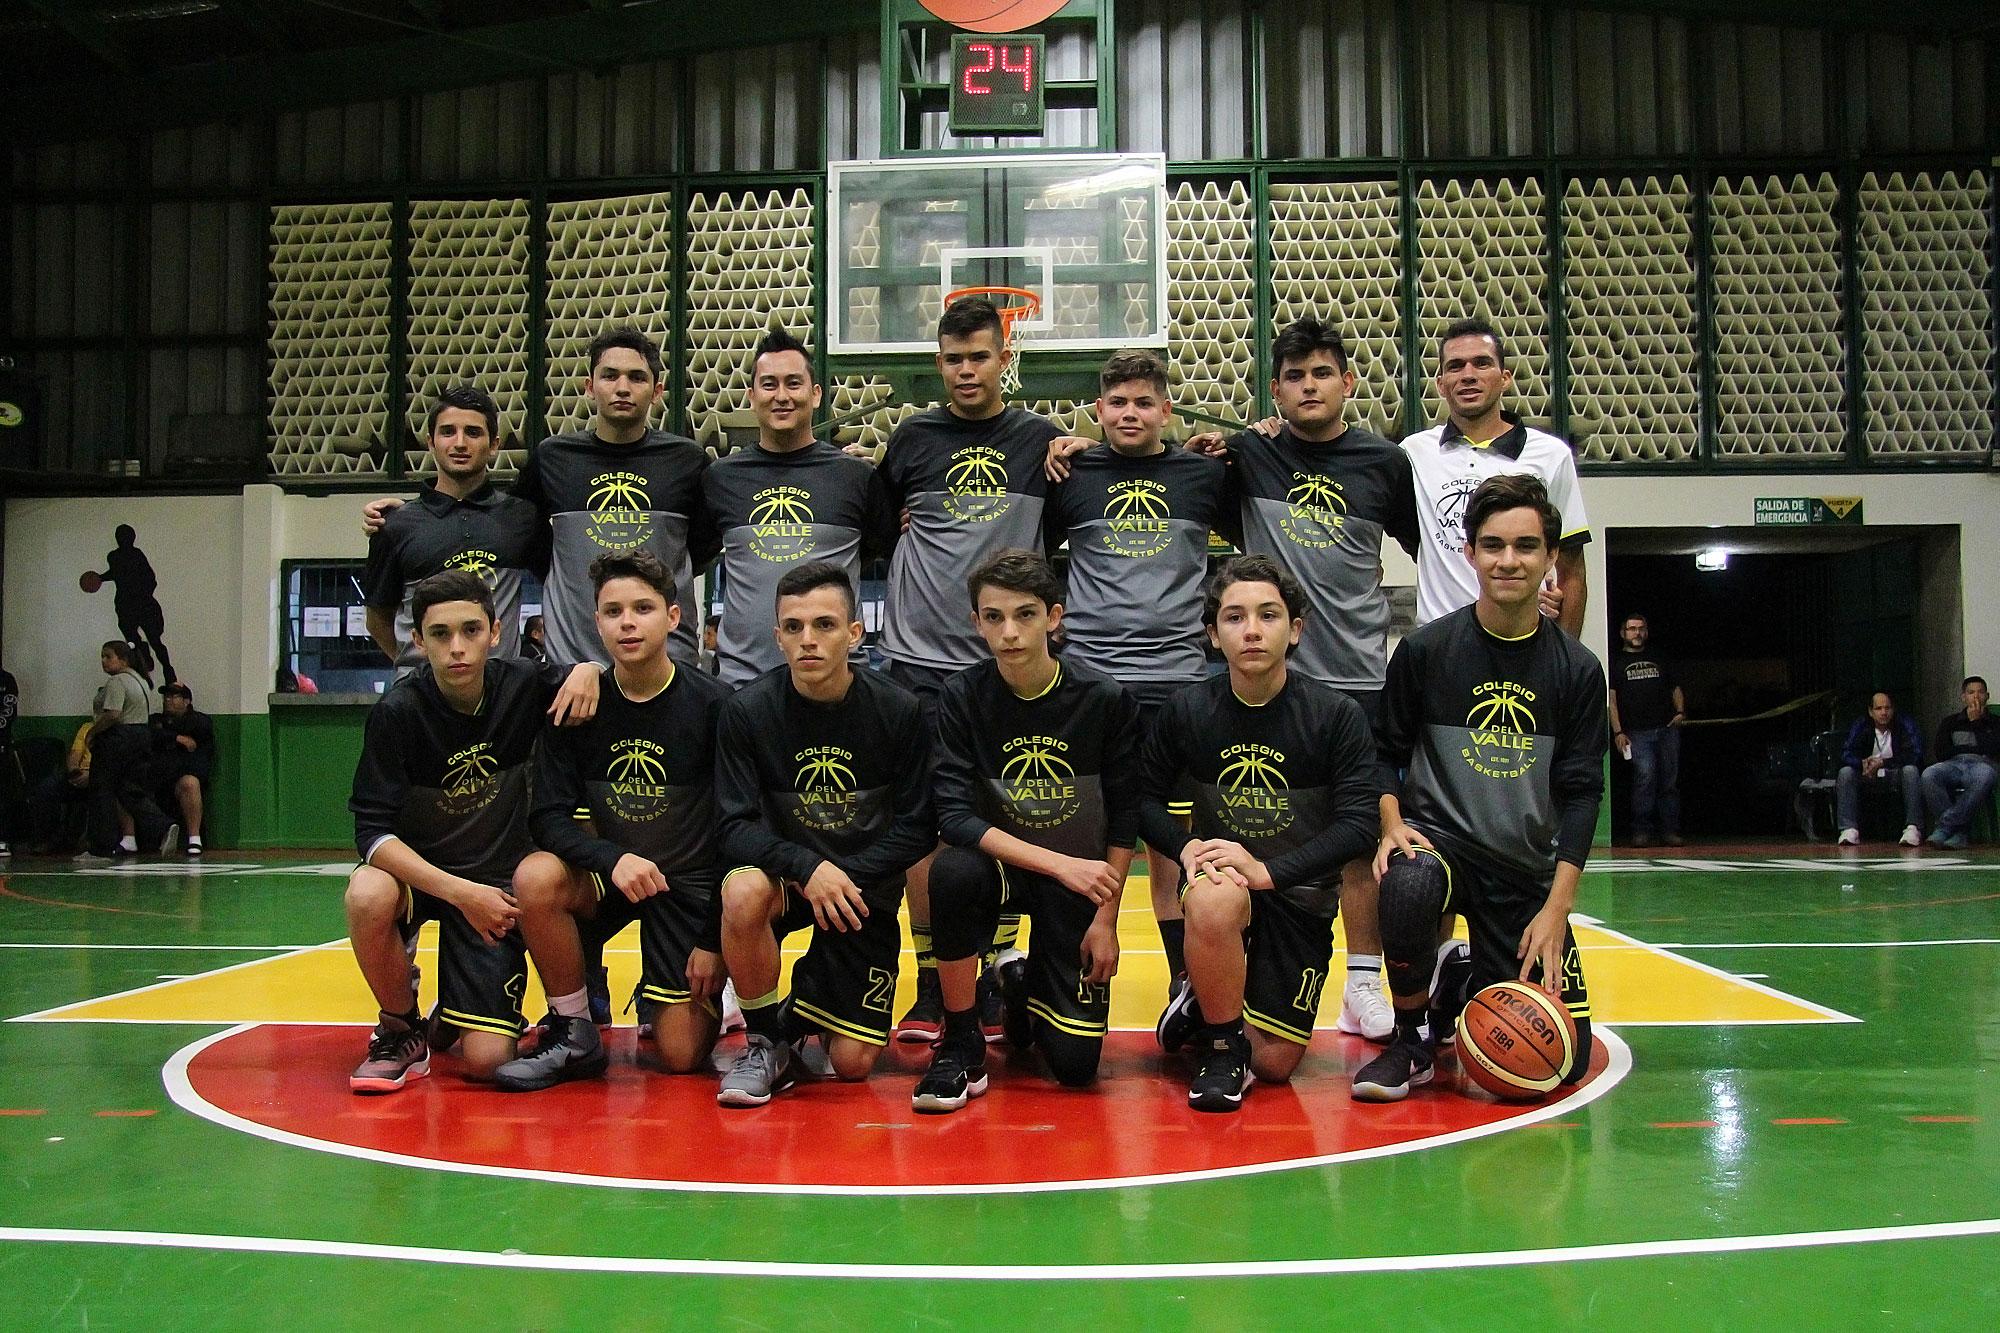 Equipo Baloncesto